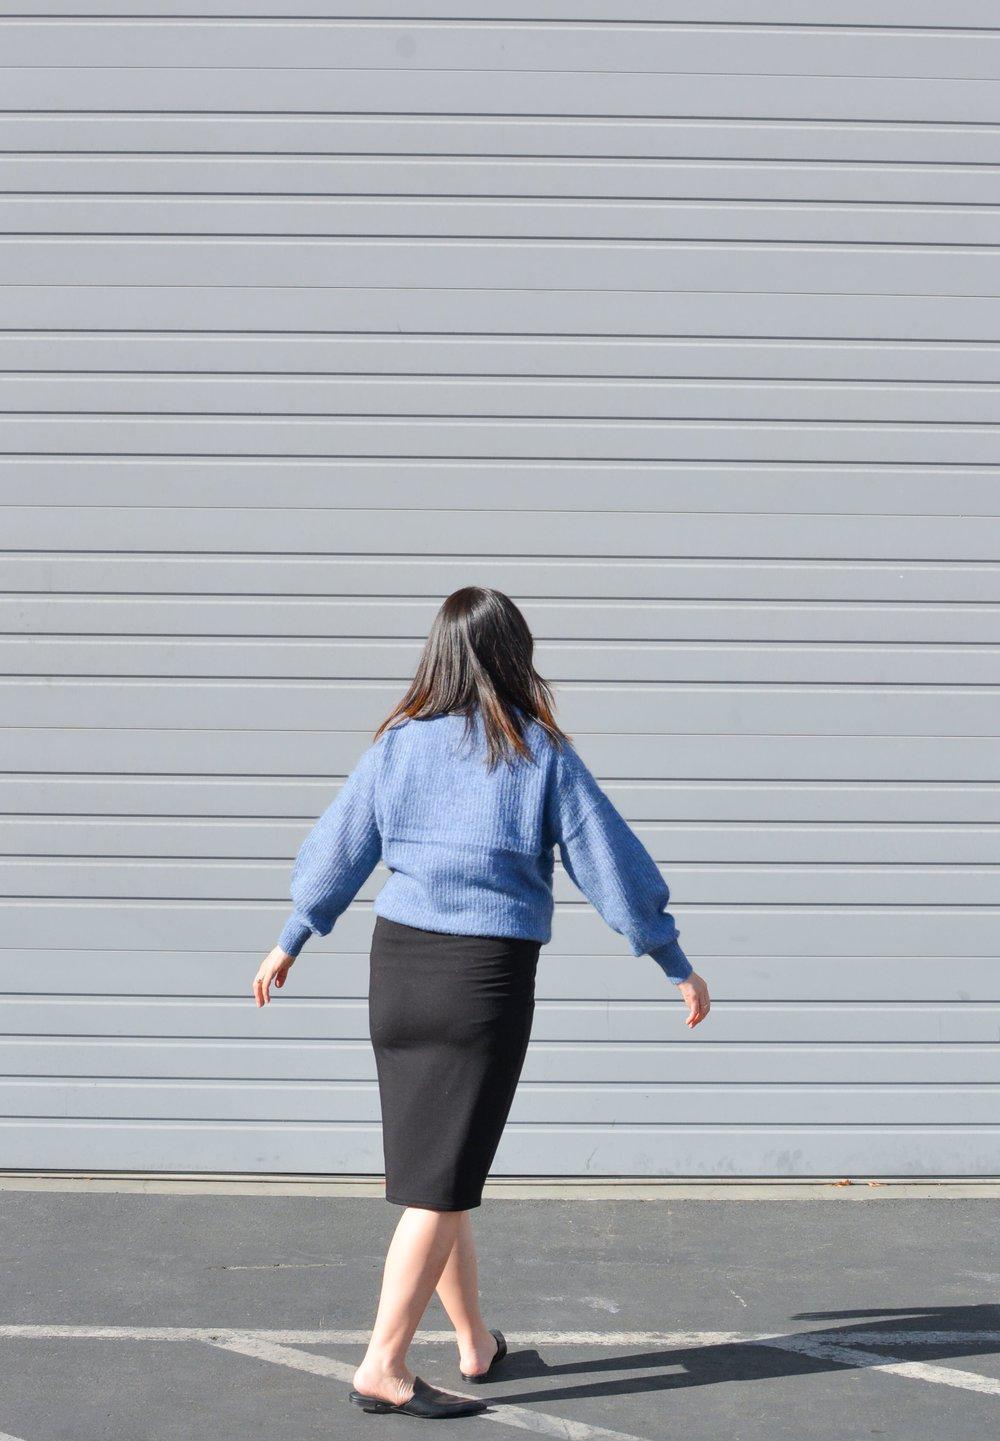 Storq Pencil Skirt Review (3 of 3)-min.jpg